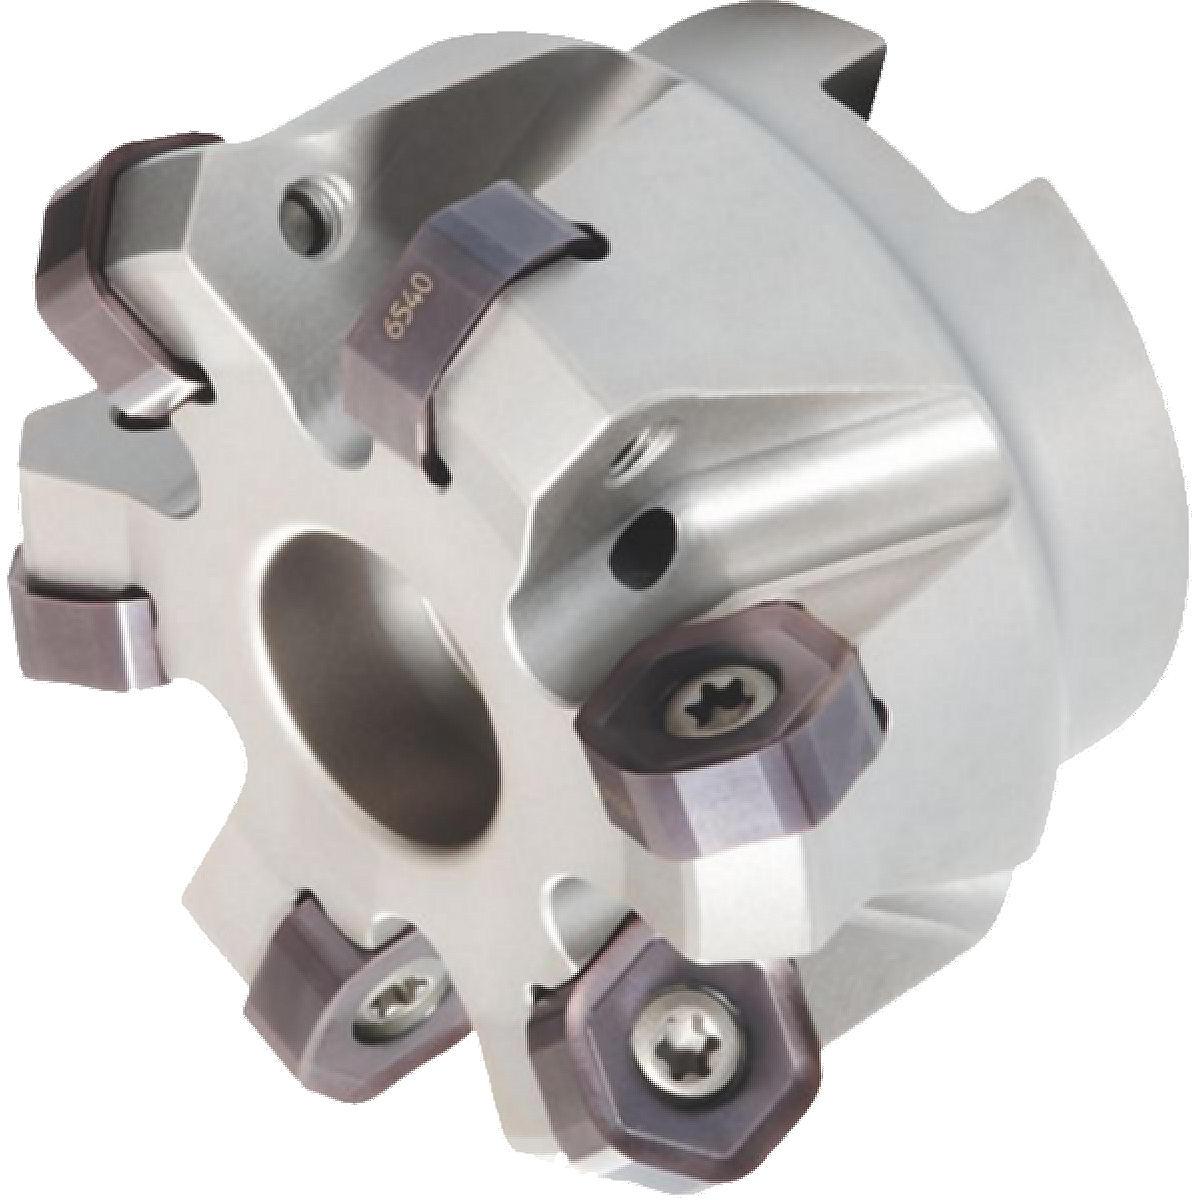 45° • Shell Mills • Metric